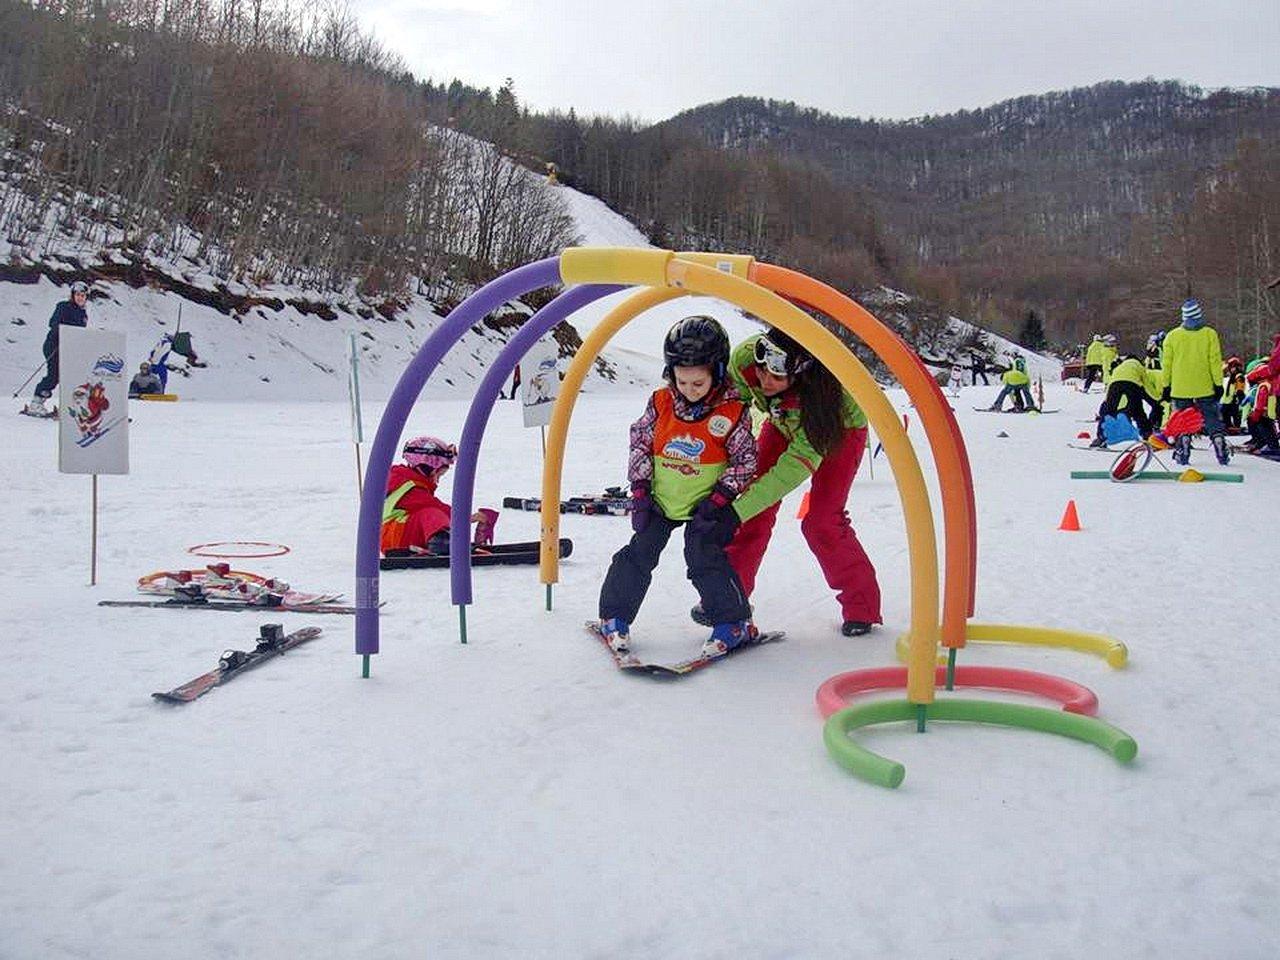 skiteam.gr-ski-academy-thessaloniki-2nd-weekend-18-19-january-2015-3-5-pigadiai-06